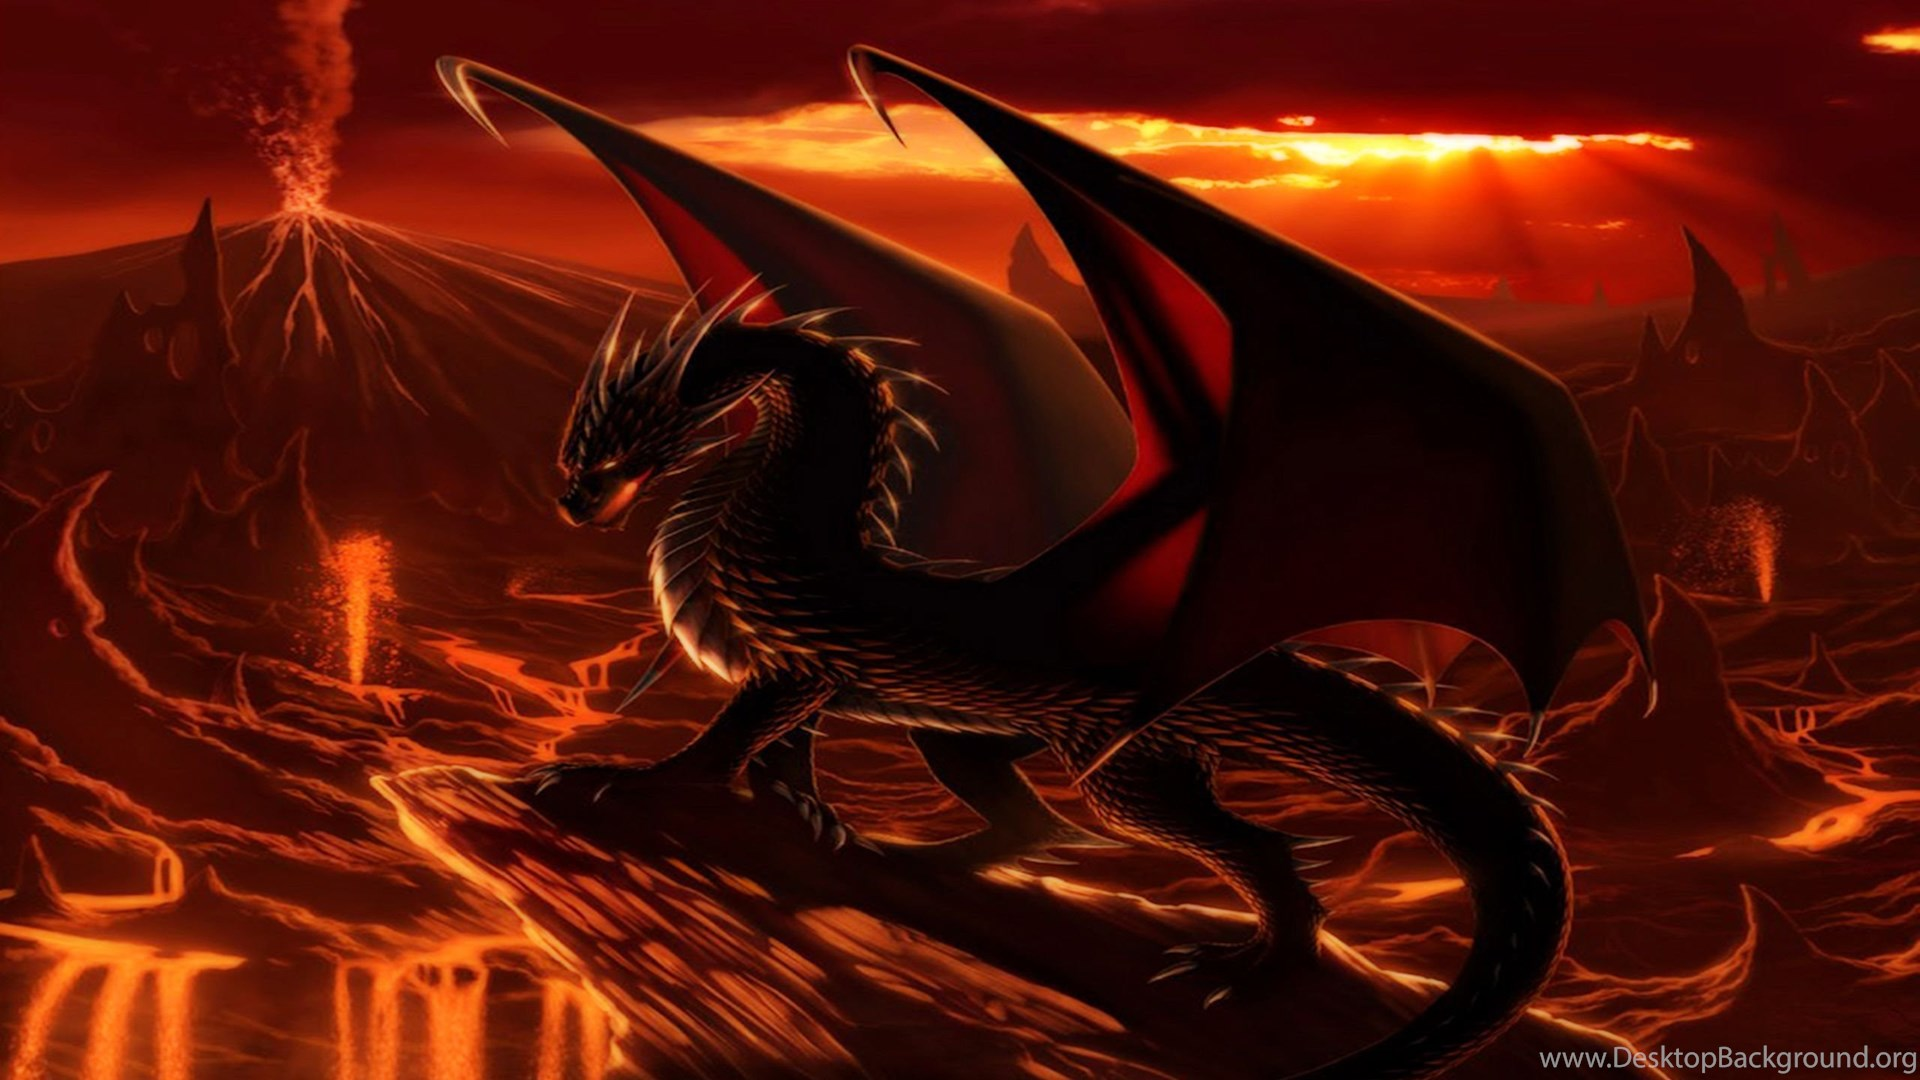 Fire Dragon Wallpaper Backgrounds Desktop Background